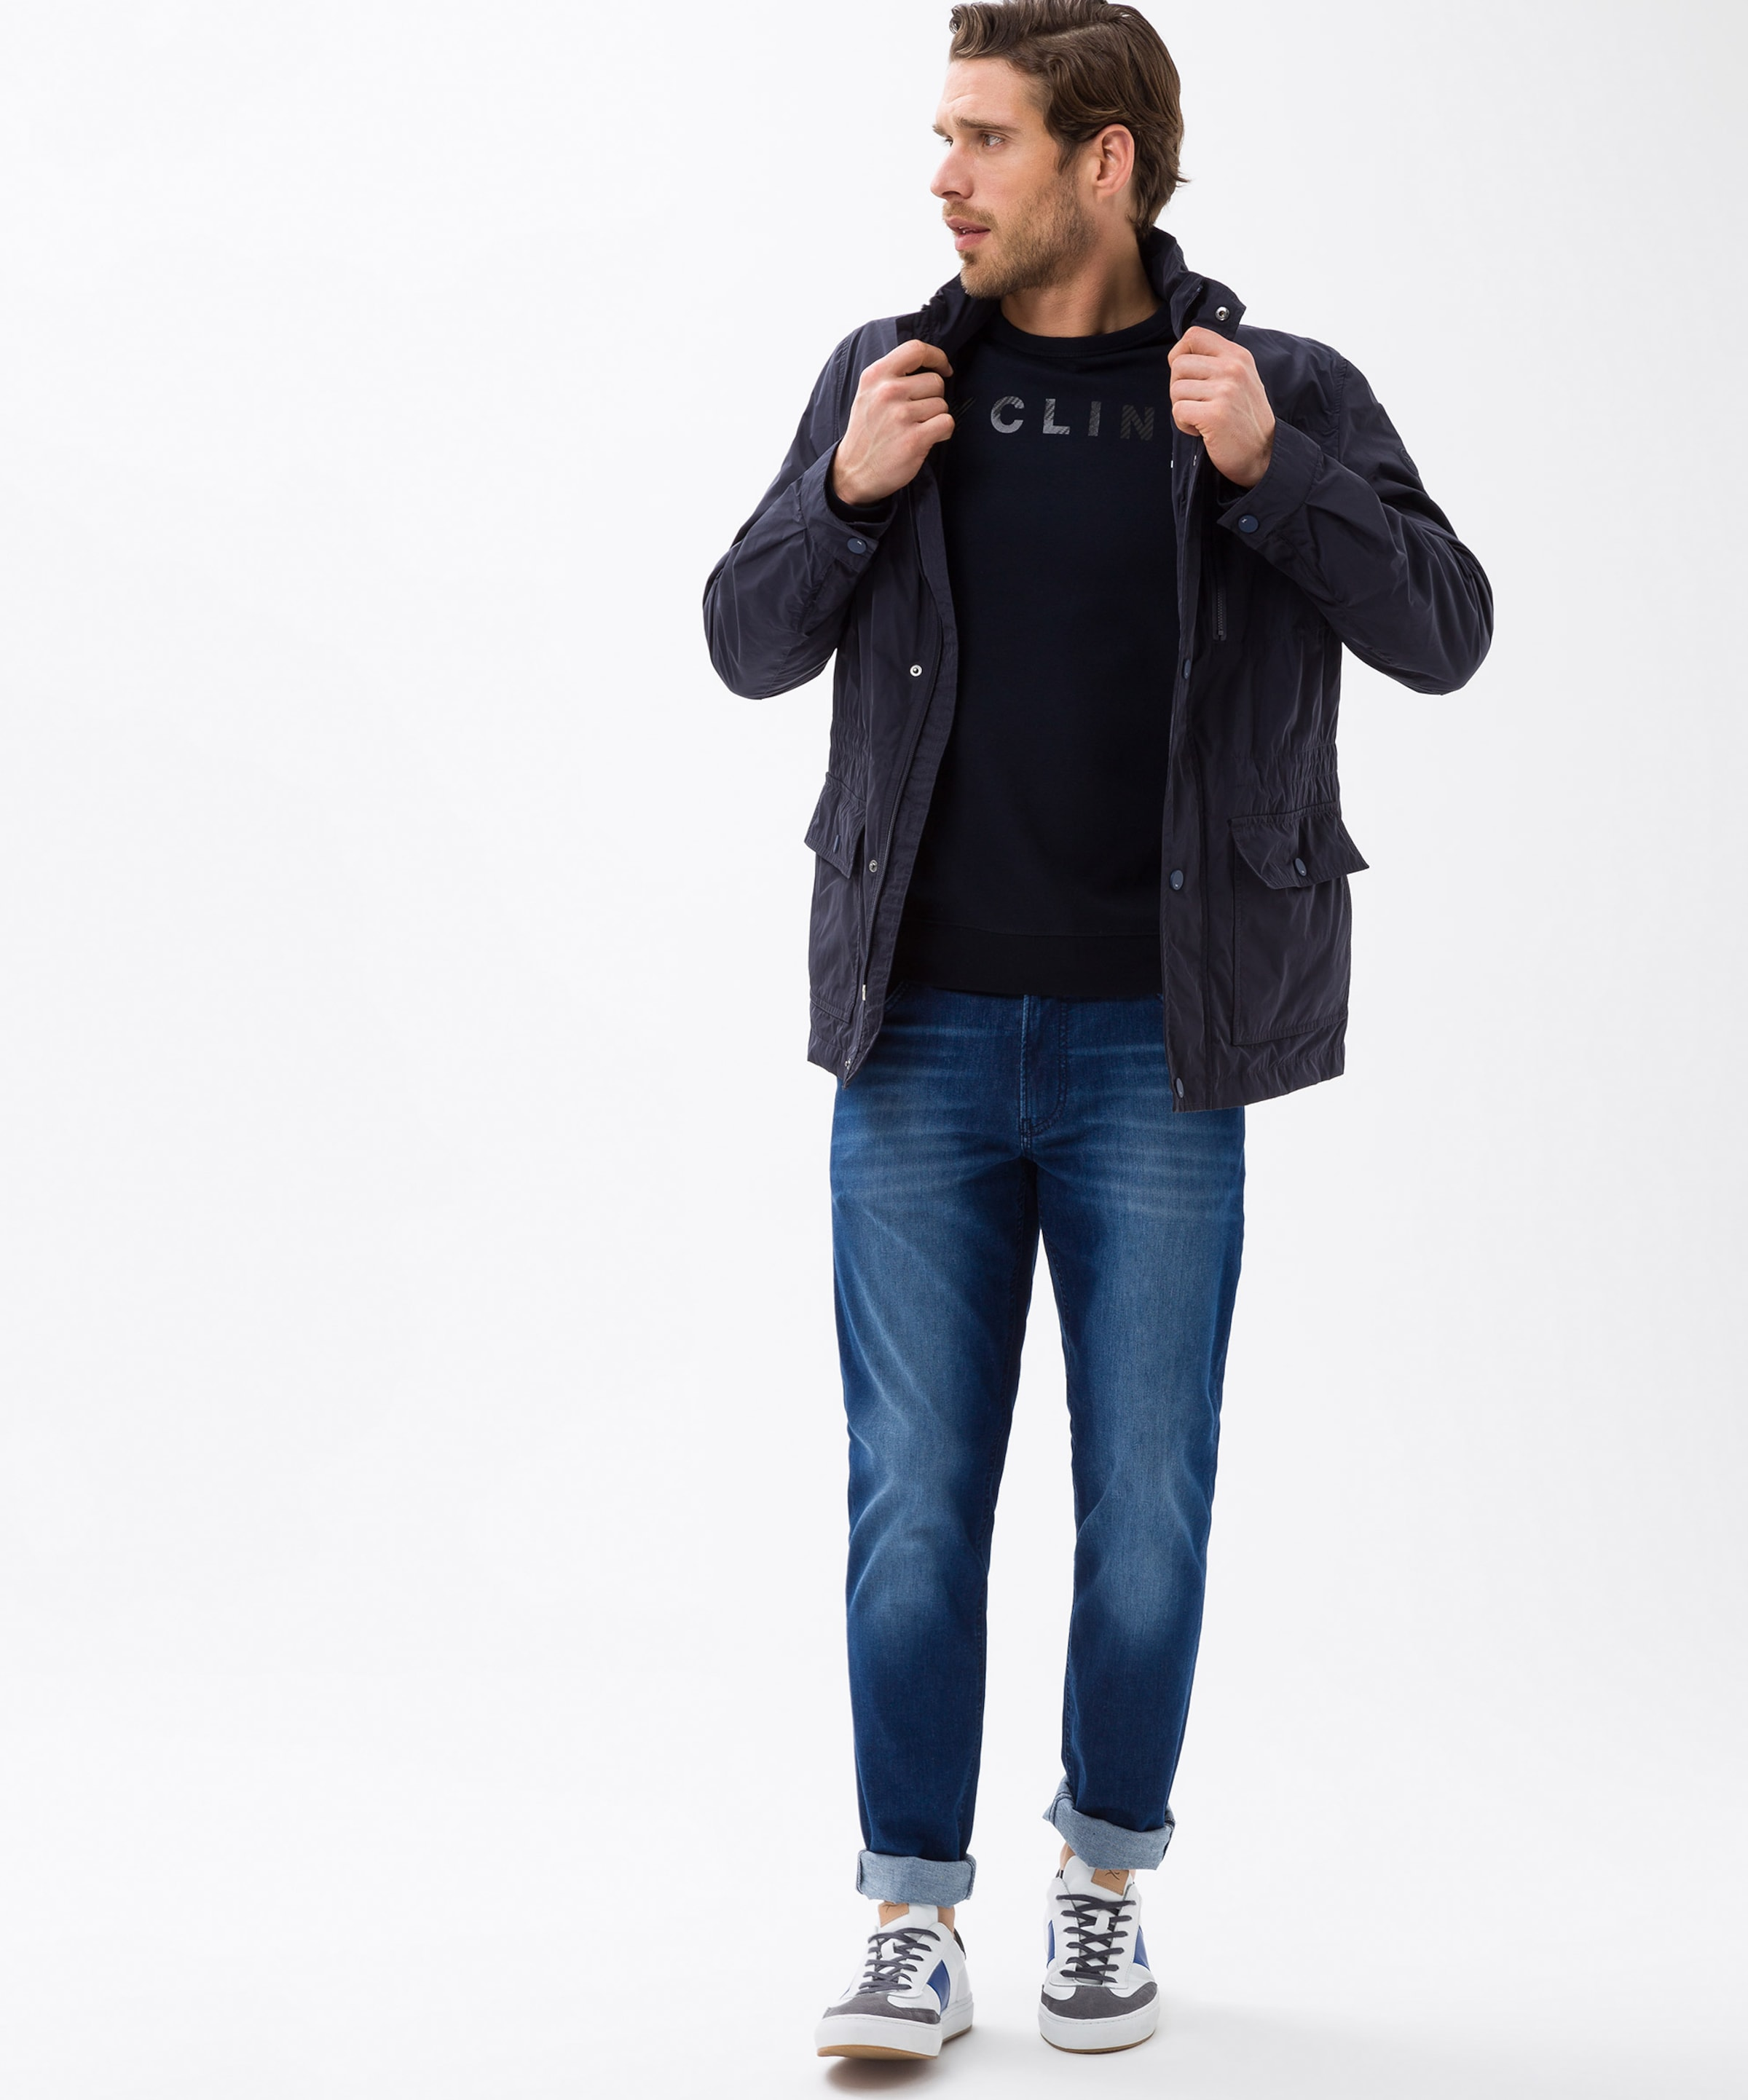 'sawyer' Weiß In KobaltblauSchwarz Brax Sweatshirt 5AjL4R